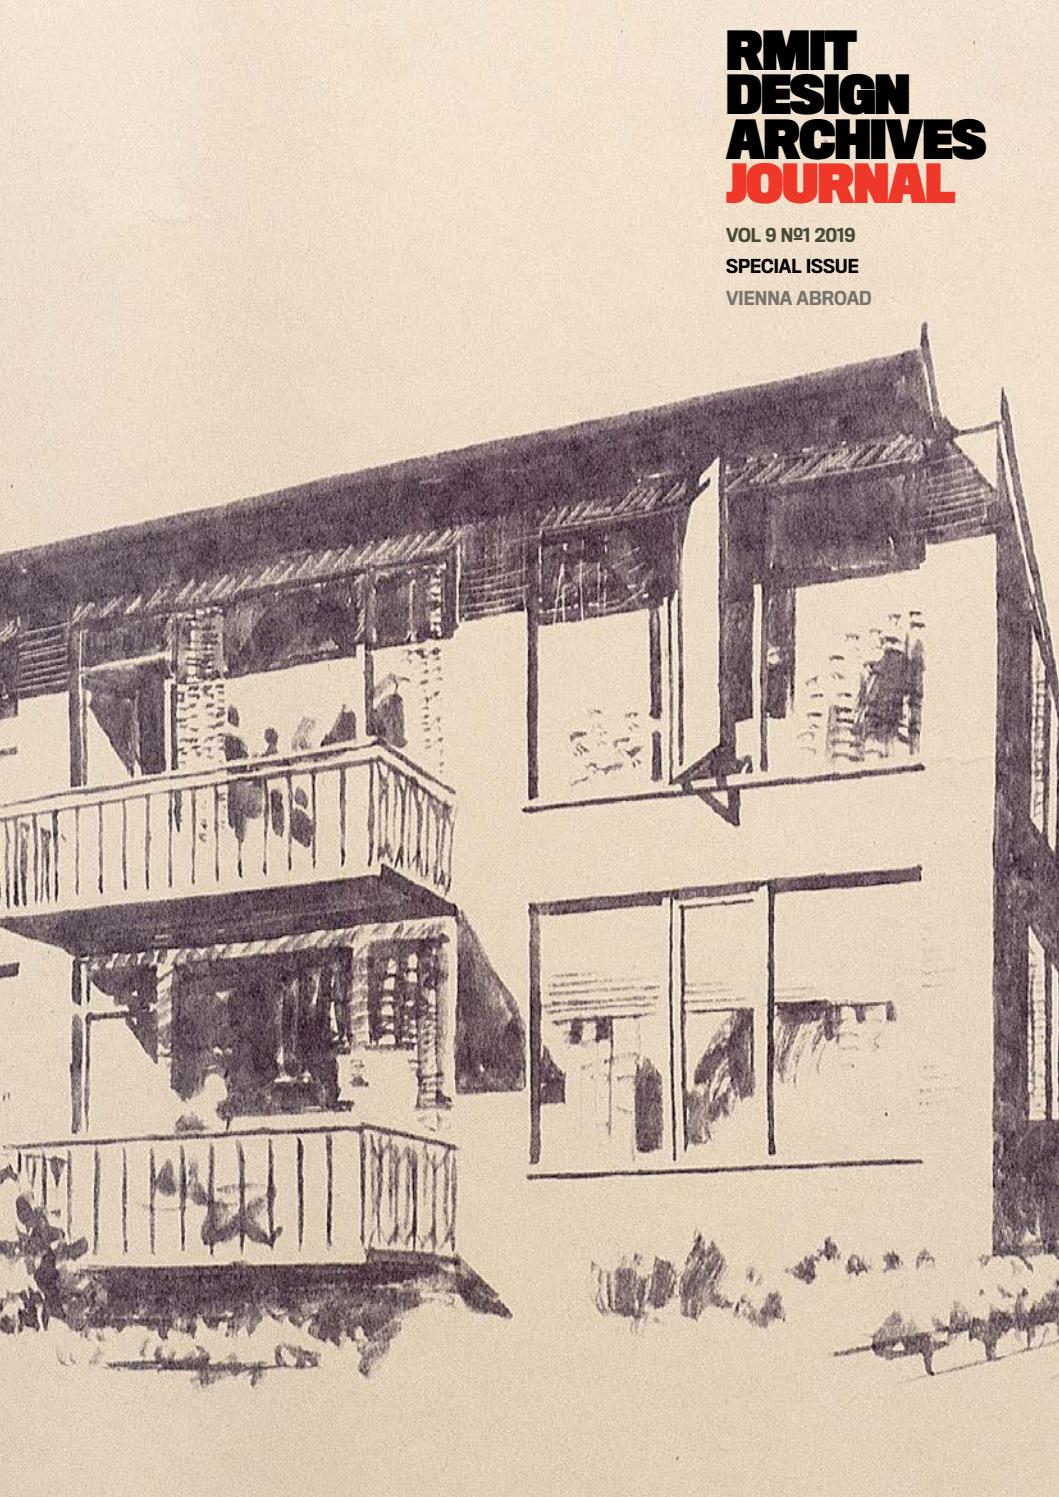 Rmit Design Archives Vol 9 No 1 2019 Special Issue Vienna Abroad By Rmit Design Archives Issuu